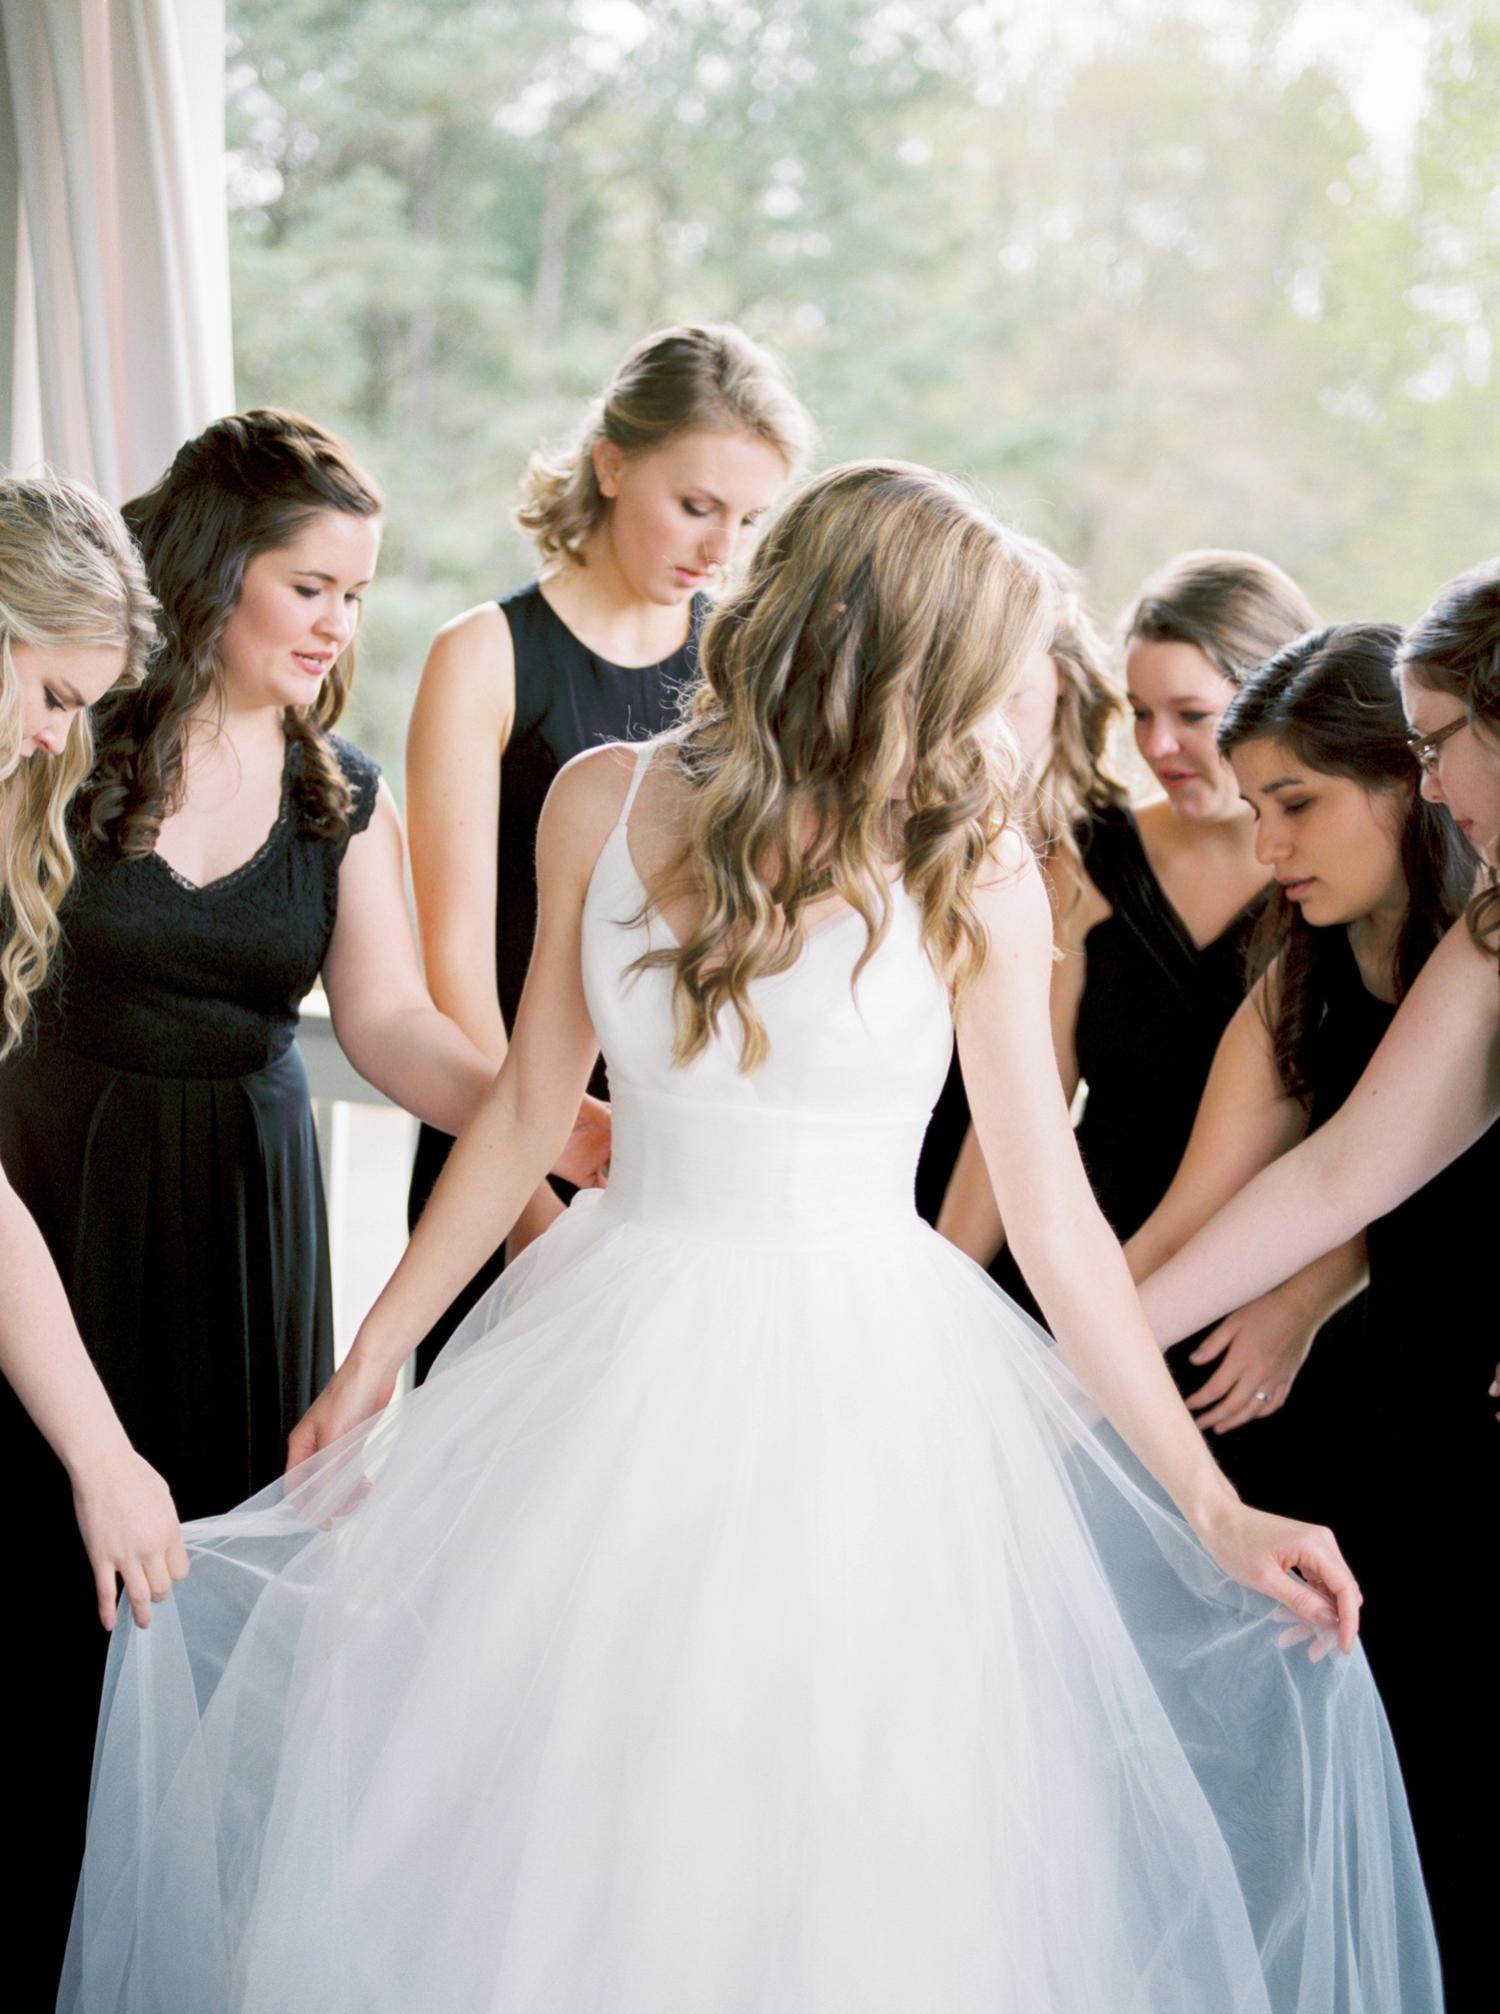 fine-art-film-charleston-south-carolina-wedding-photographer-atlanta-georgia_3349.jpg